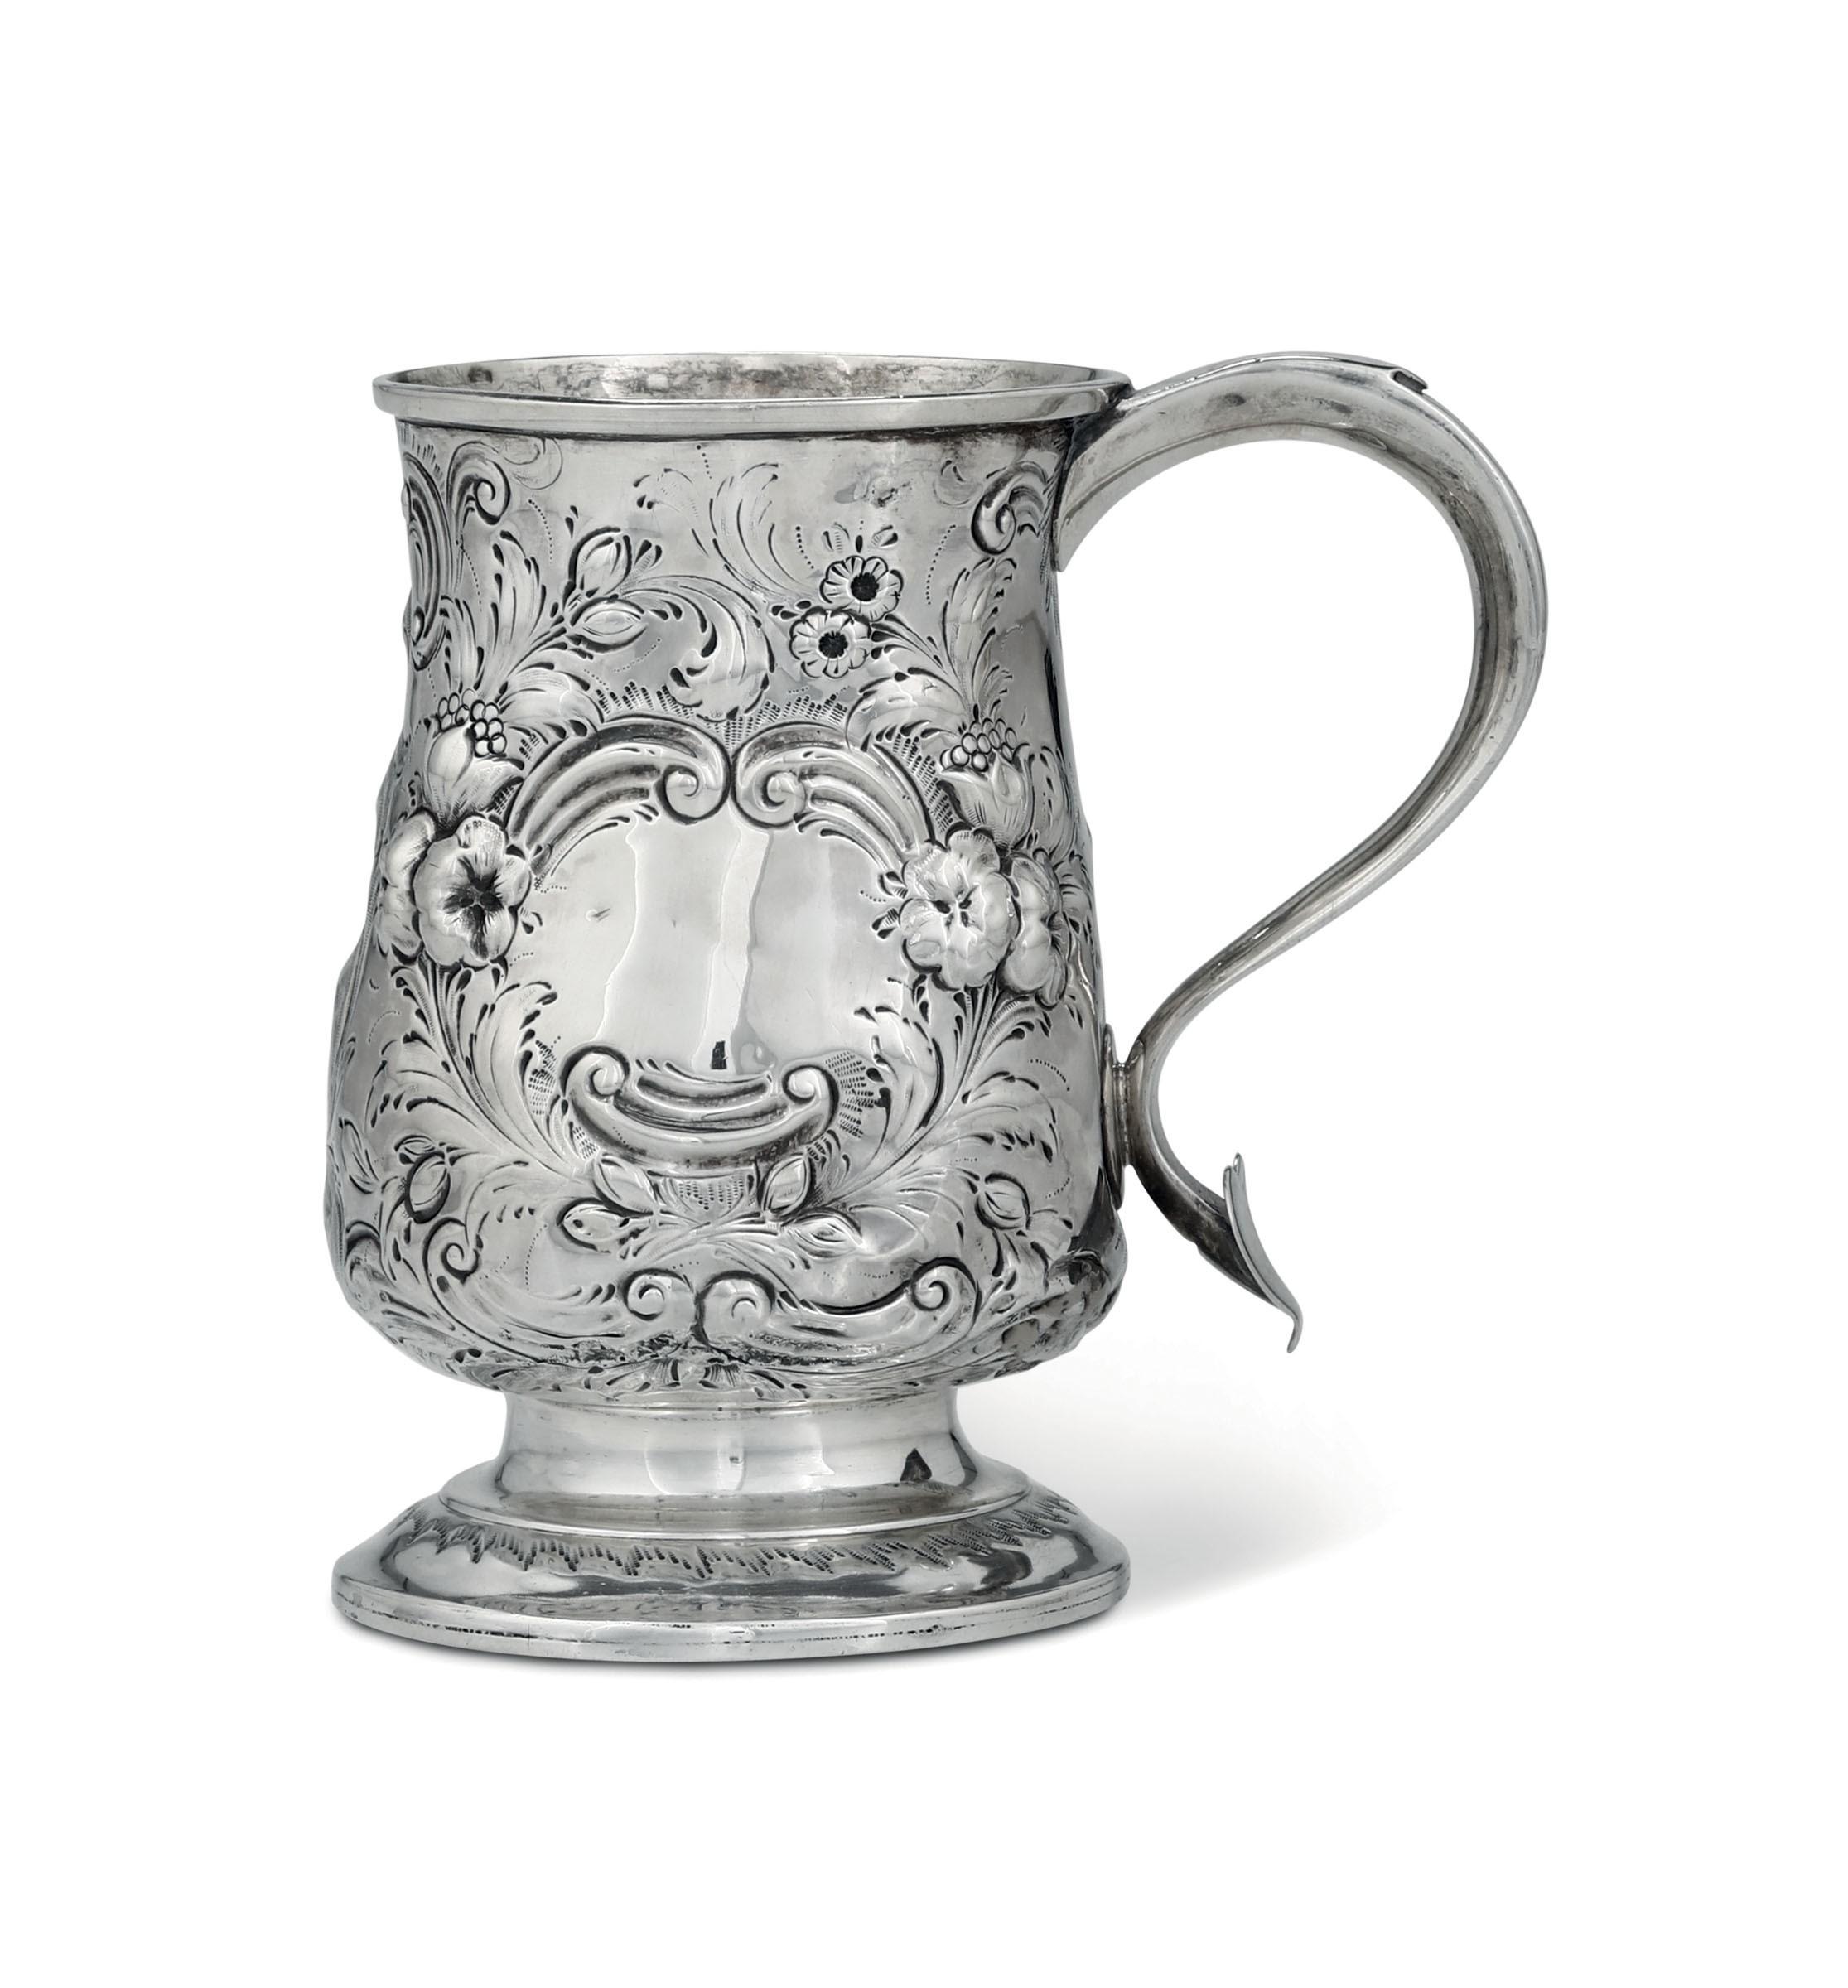 A silver tankard, London, 1759 - H 13.3cm, 260gr -